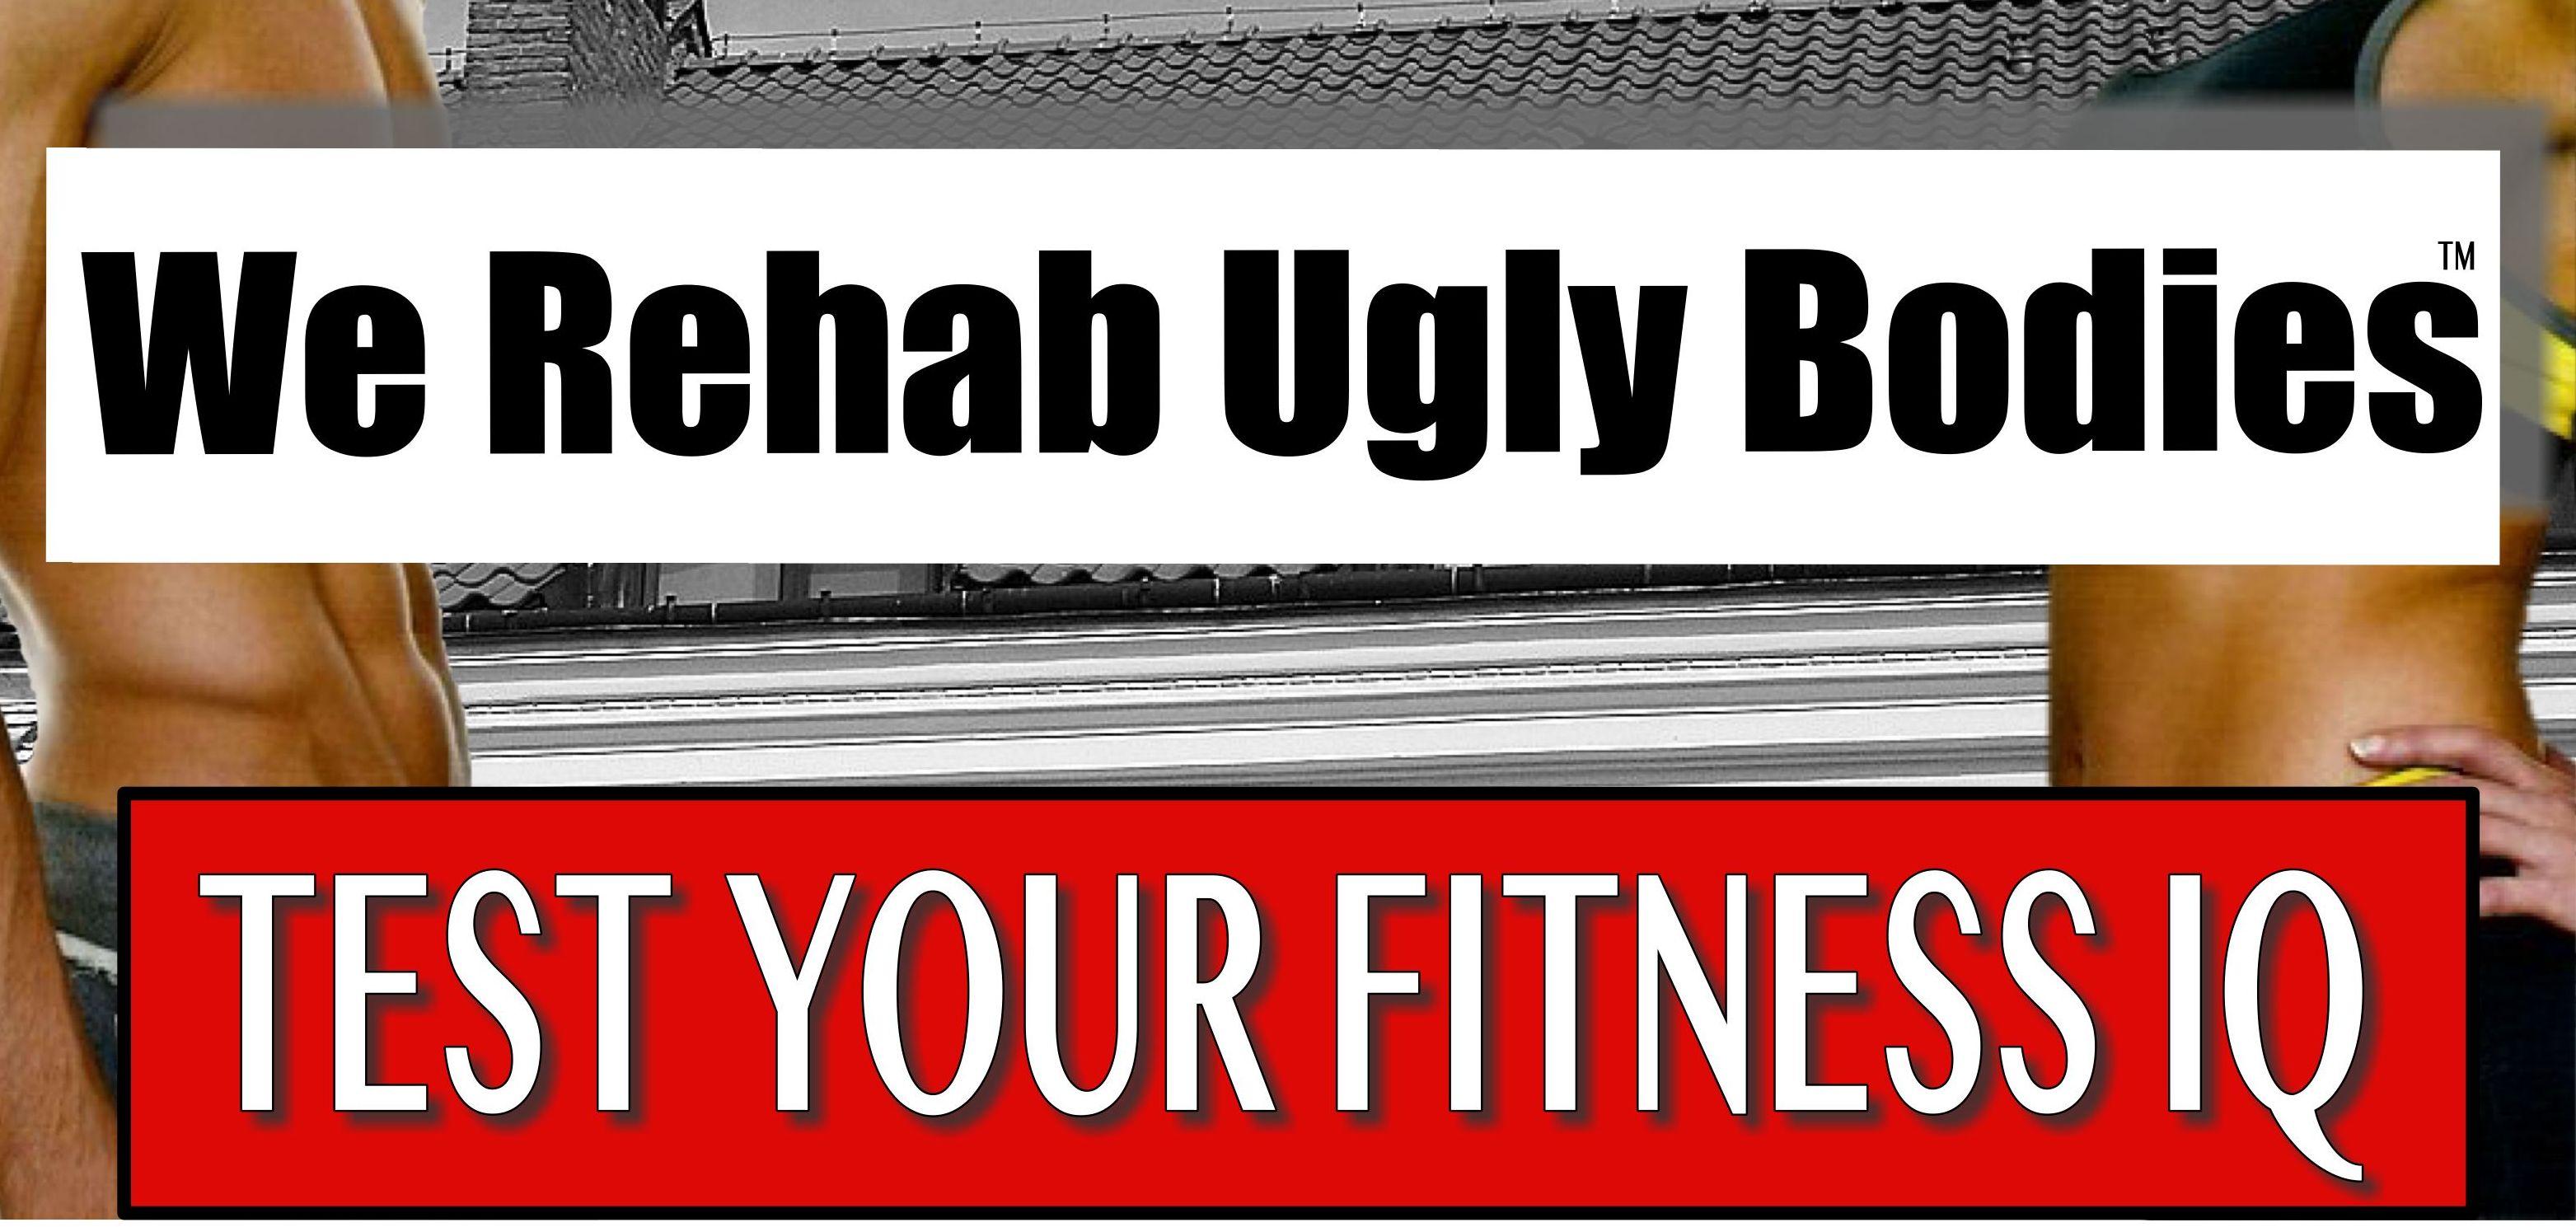 we rehab ugly bodies